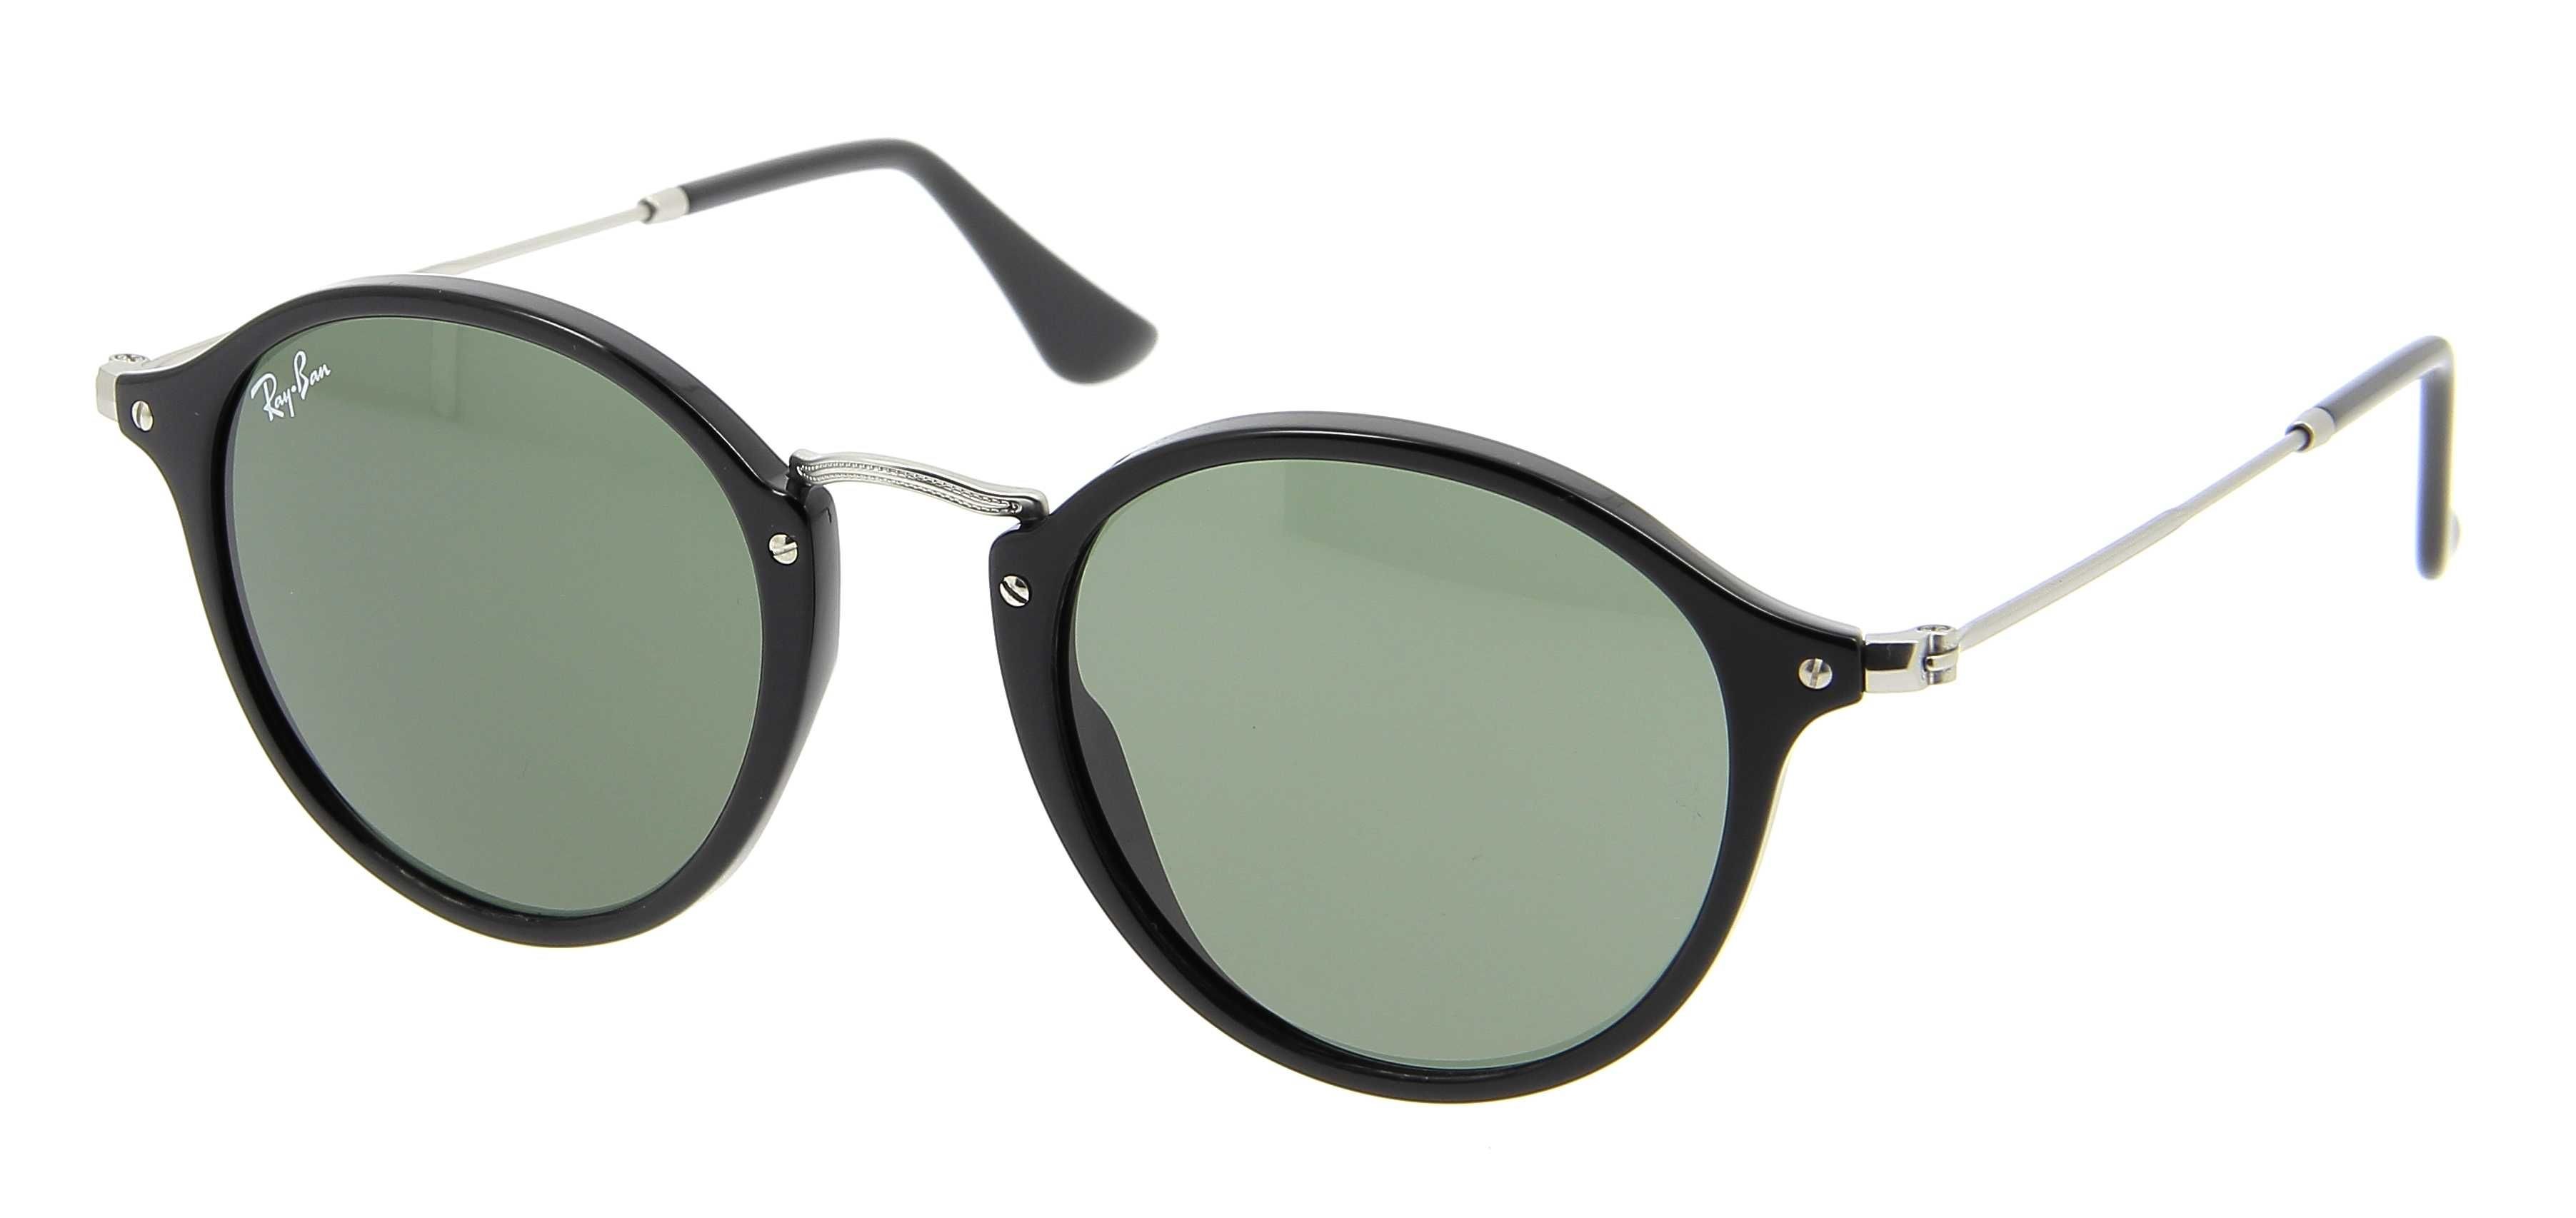 achat lunette en ligne ray ban